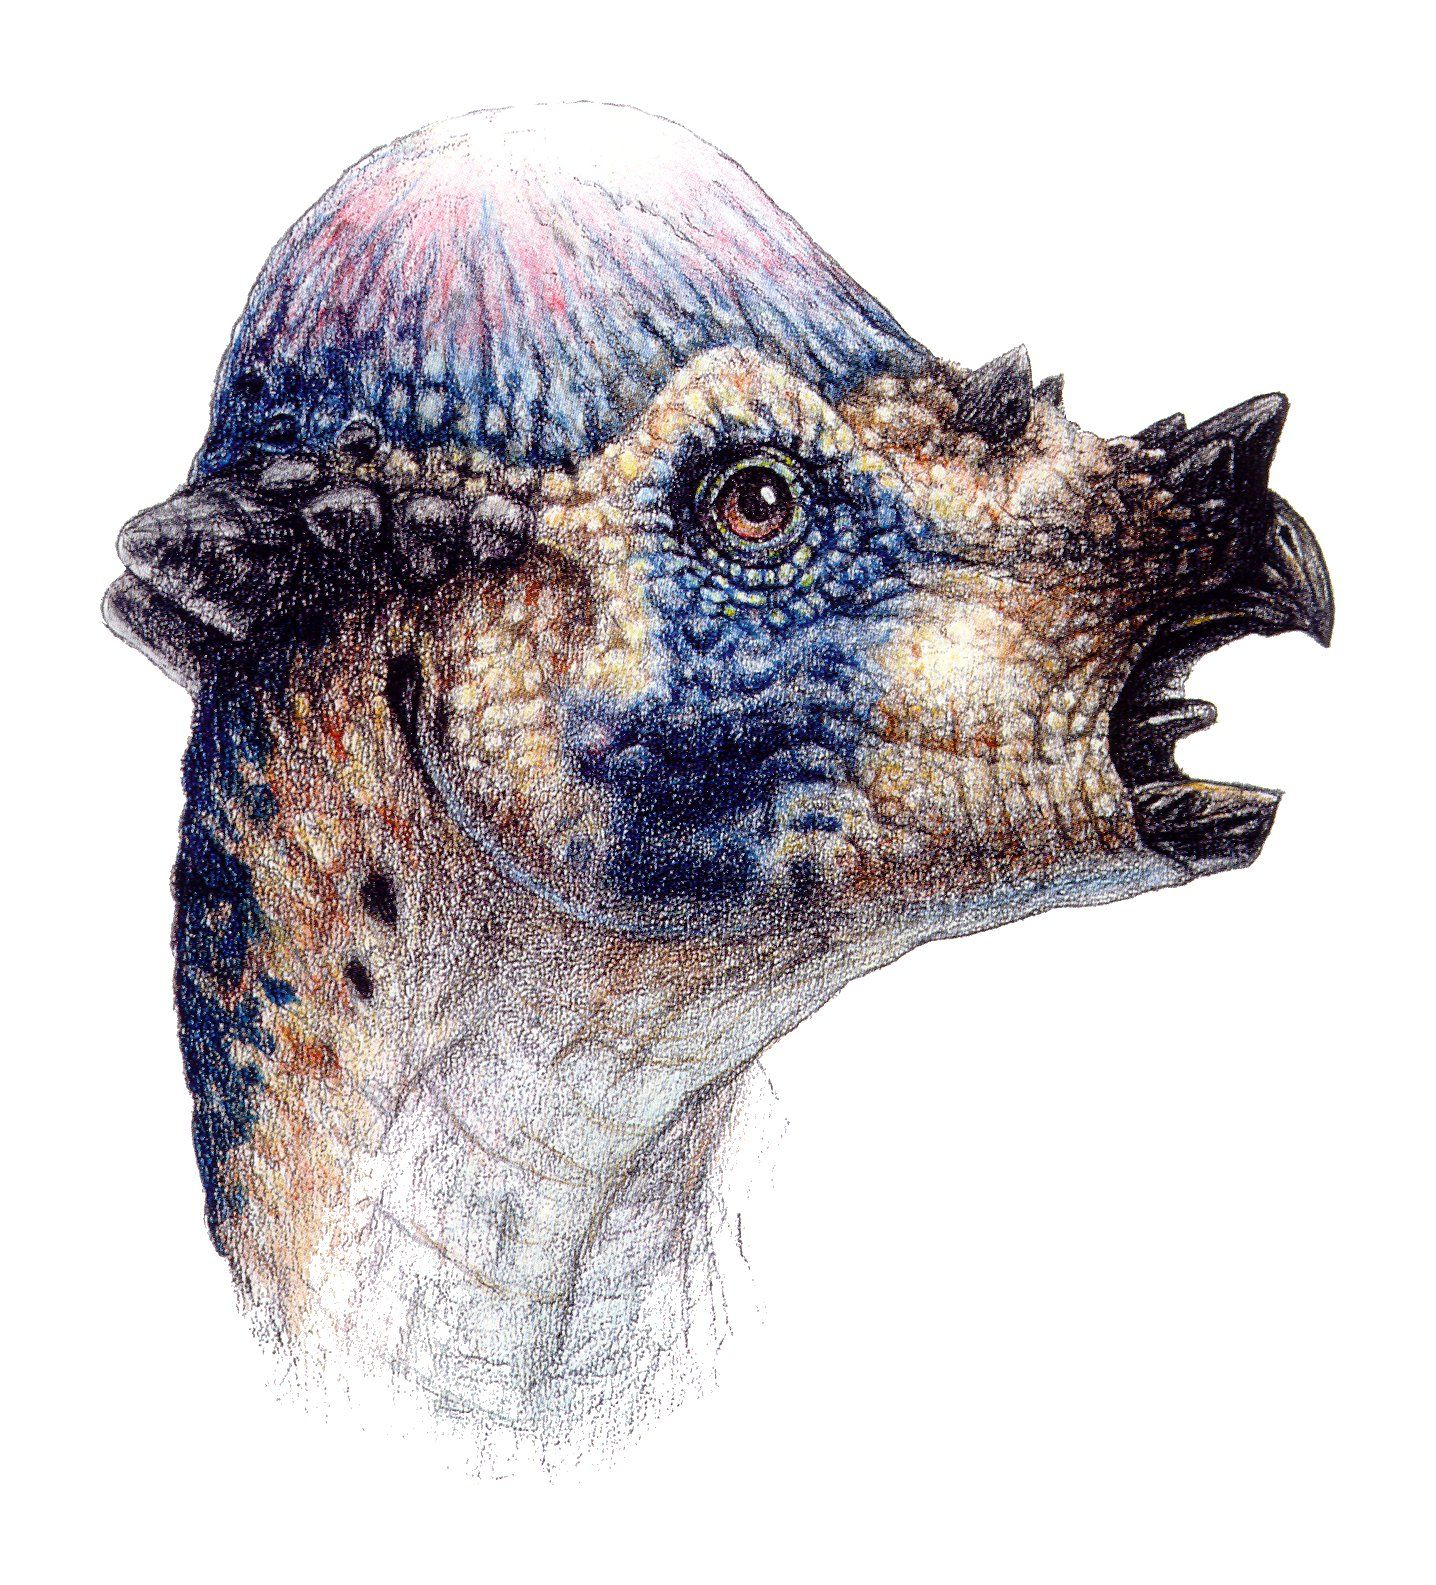 The Lost World Jurassic Park Pachycephalosaurus head ... Pachycephalosaurus Head